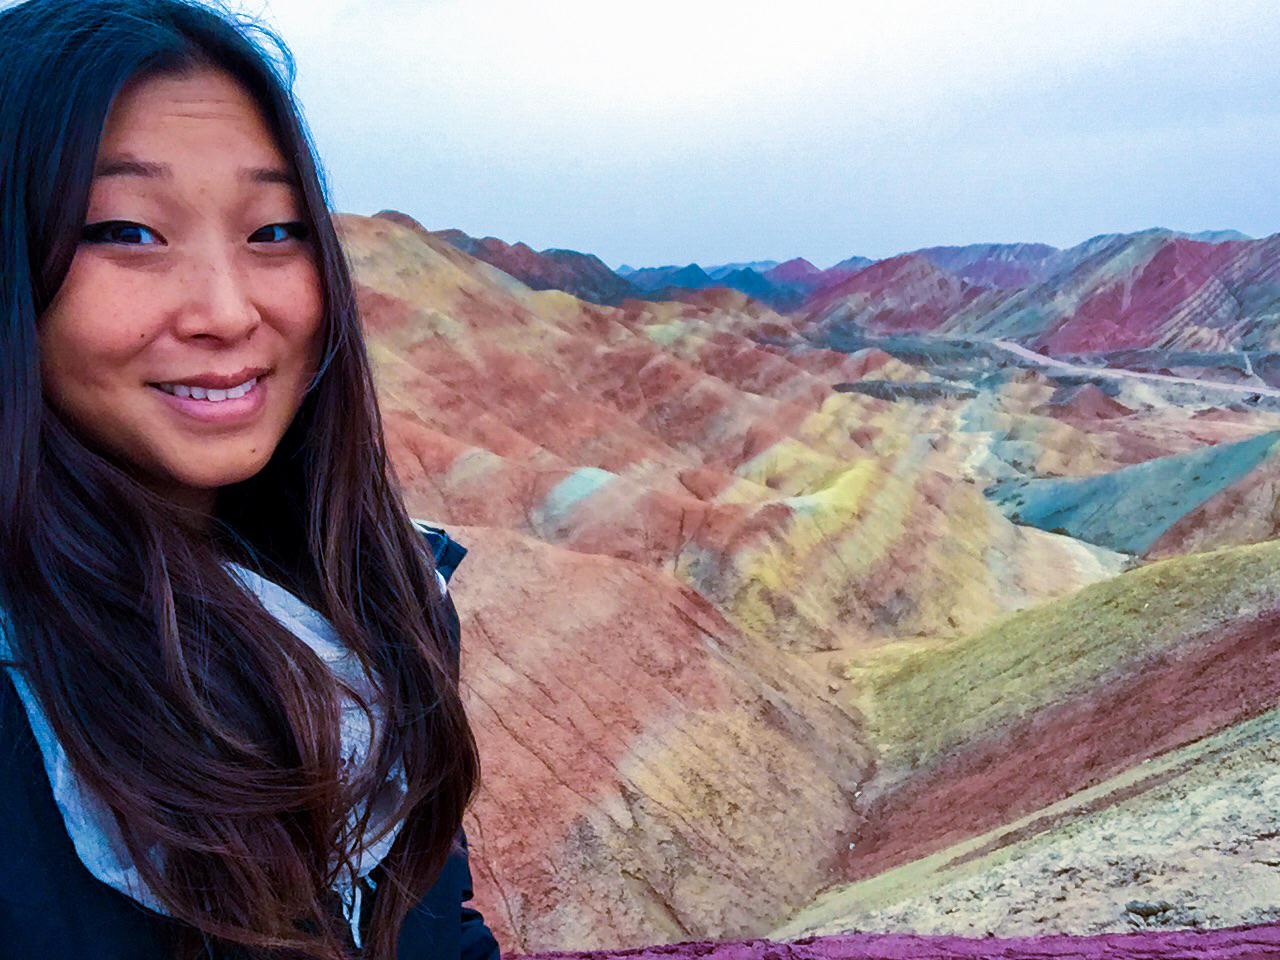 Danxia Rainbow Mountains, China